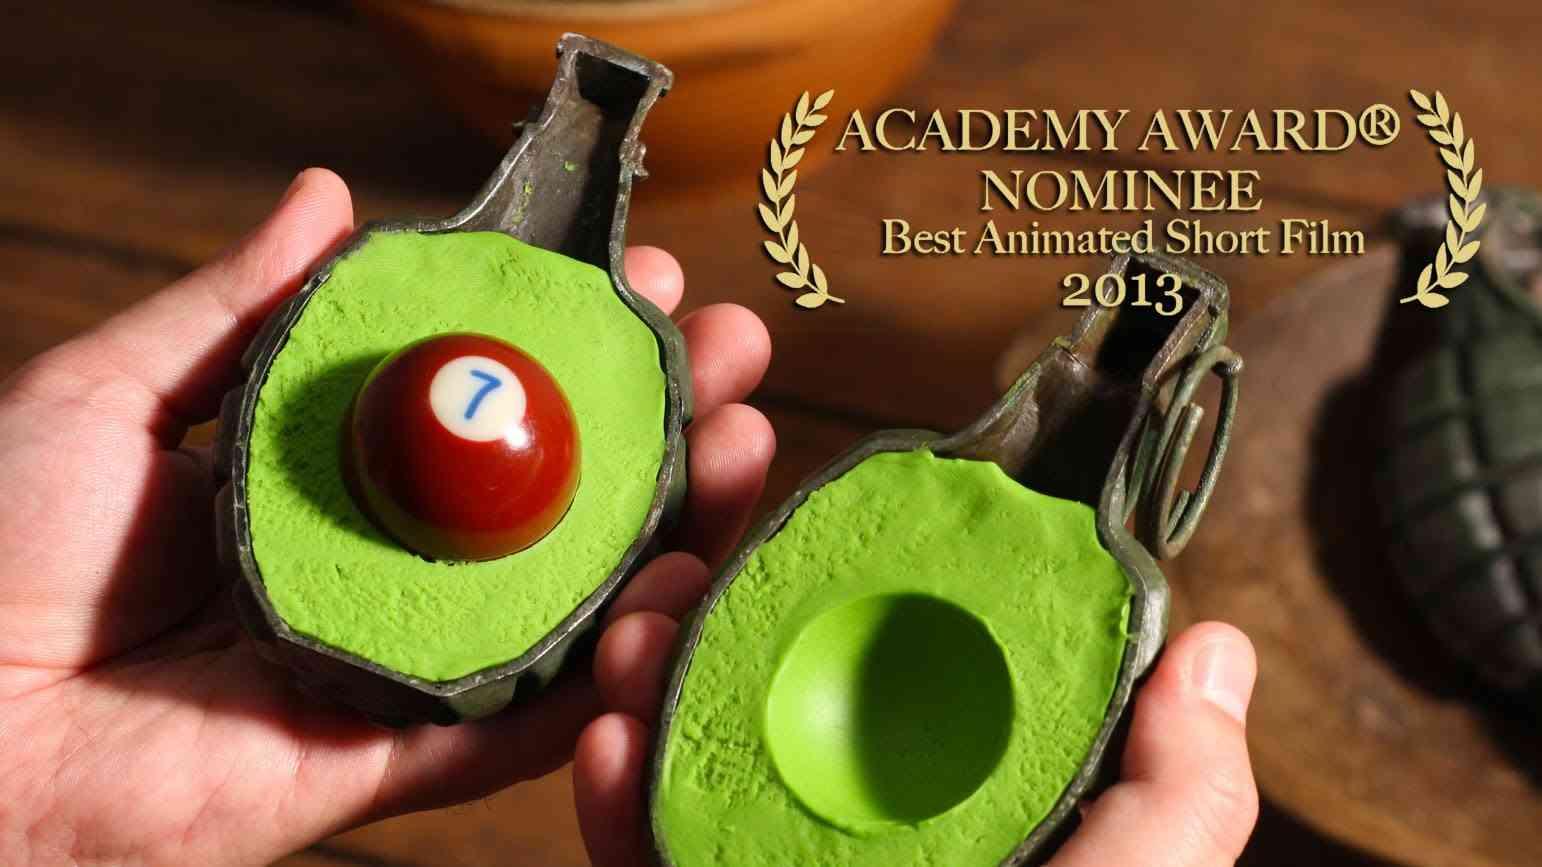 Fresh Guacamole by PES | Oscar Nominated Short - YouTube